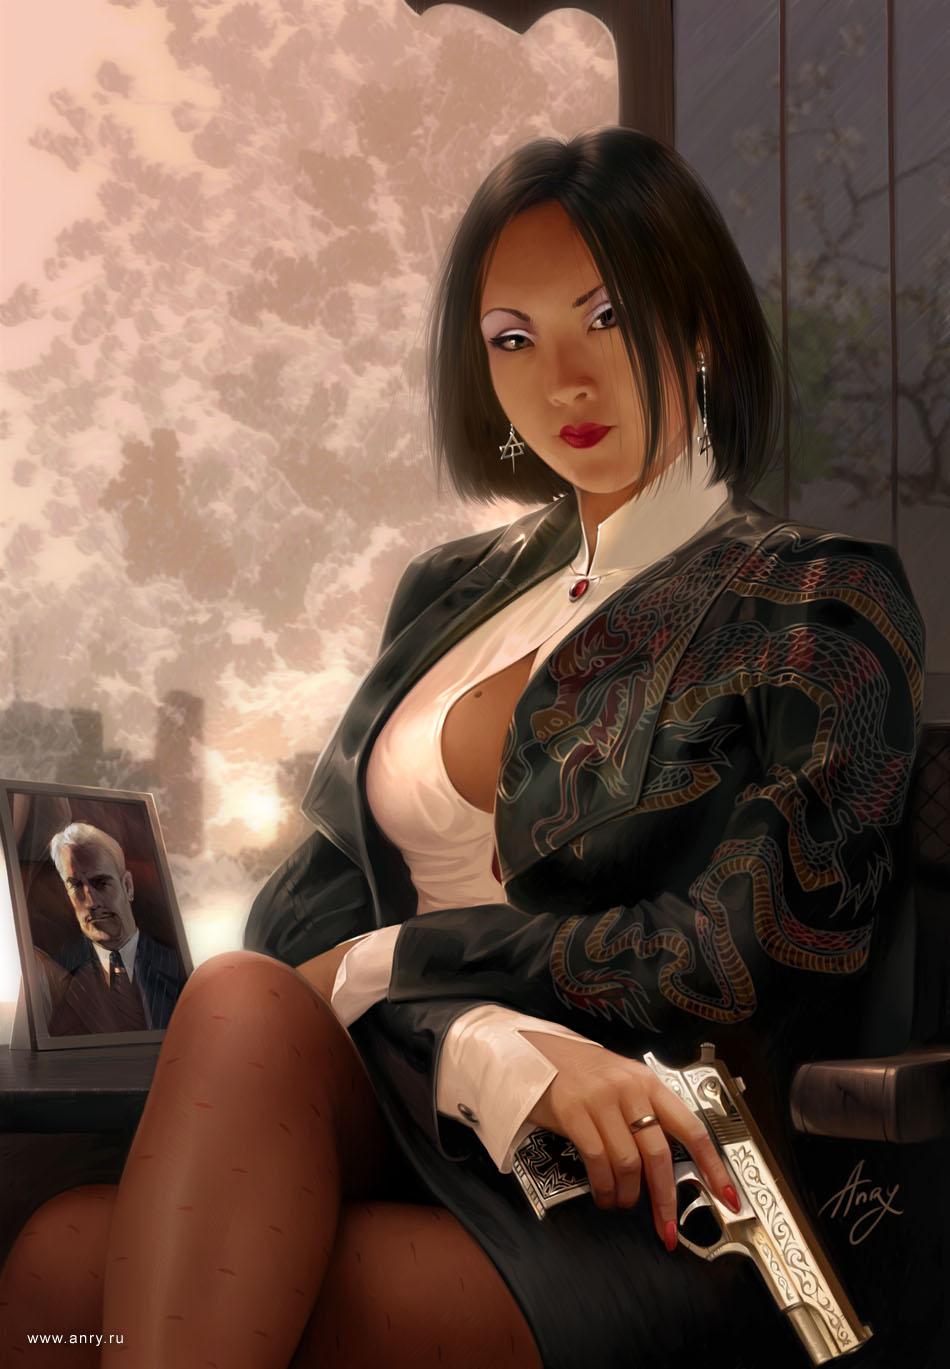 http://forumupload.ru/uploads/000d/f4/54/205-3-f.jpg